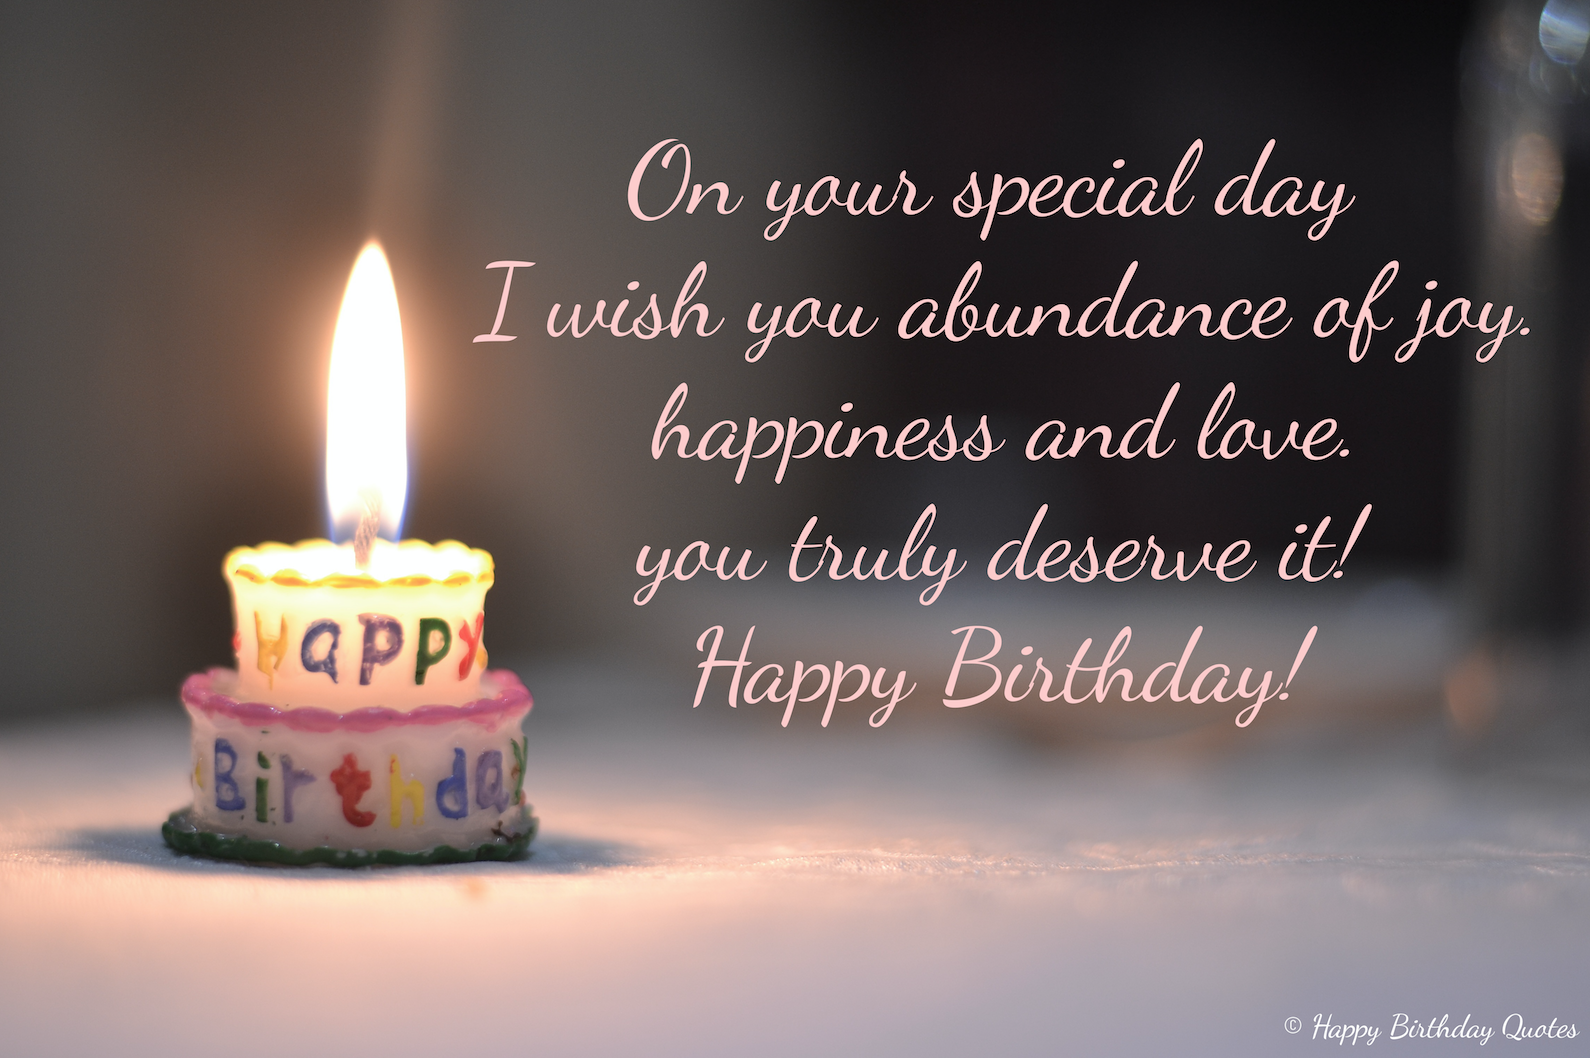 Happy Birthday Quotes Happy Birthday Cake Message Happy Birthday Gi Happy Birthday Quotes For Friends Funny Happy Birthday Wishes Birthday Message For Friend